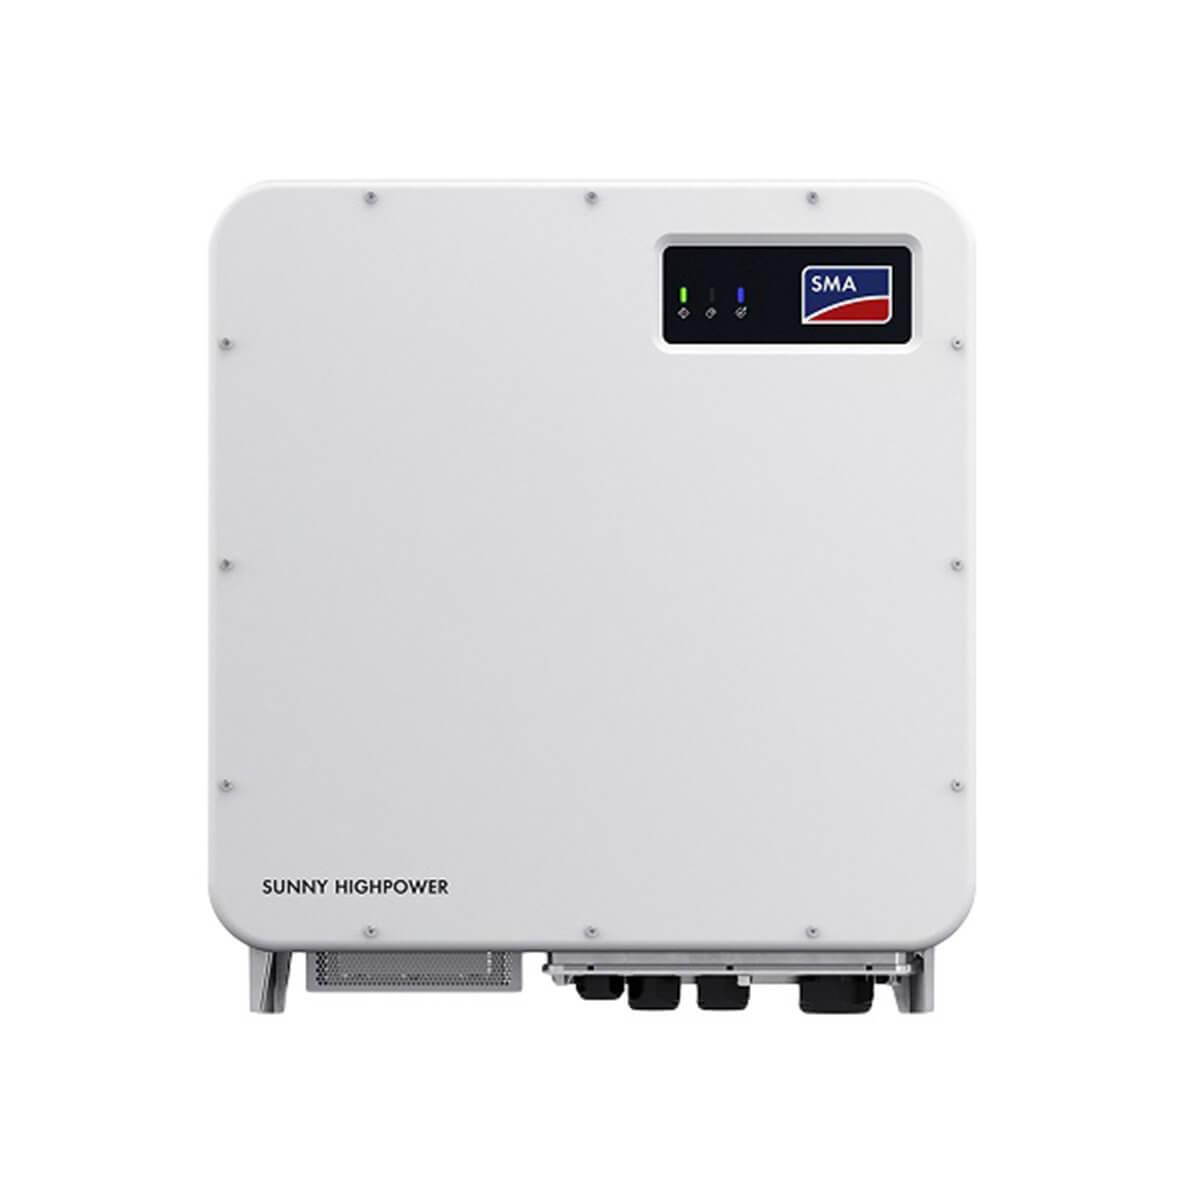 sma 150kW inverter, sma sunny highpower 150kW inverter, sma sunny highpower 150-20 inverter, sma sunny highpower 150-20, sma sunny highpower 150 kW